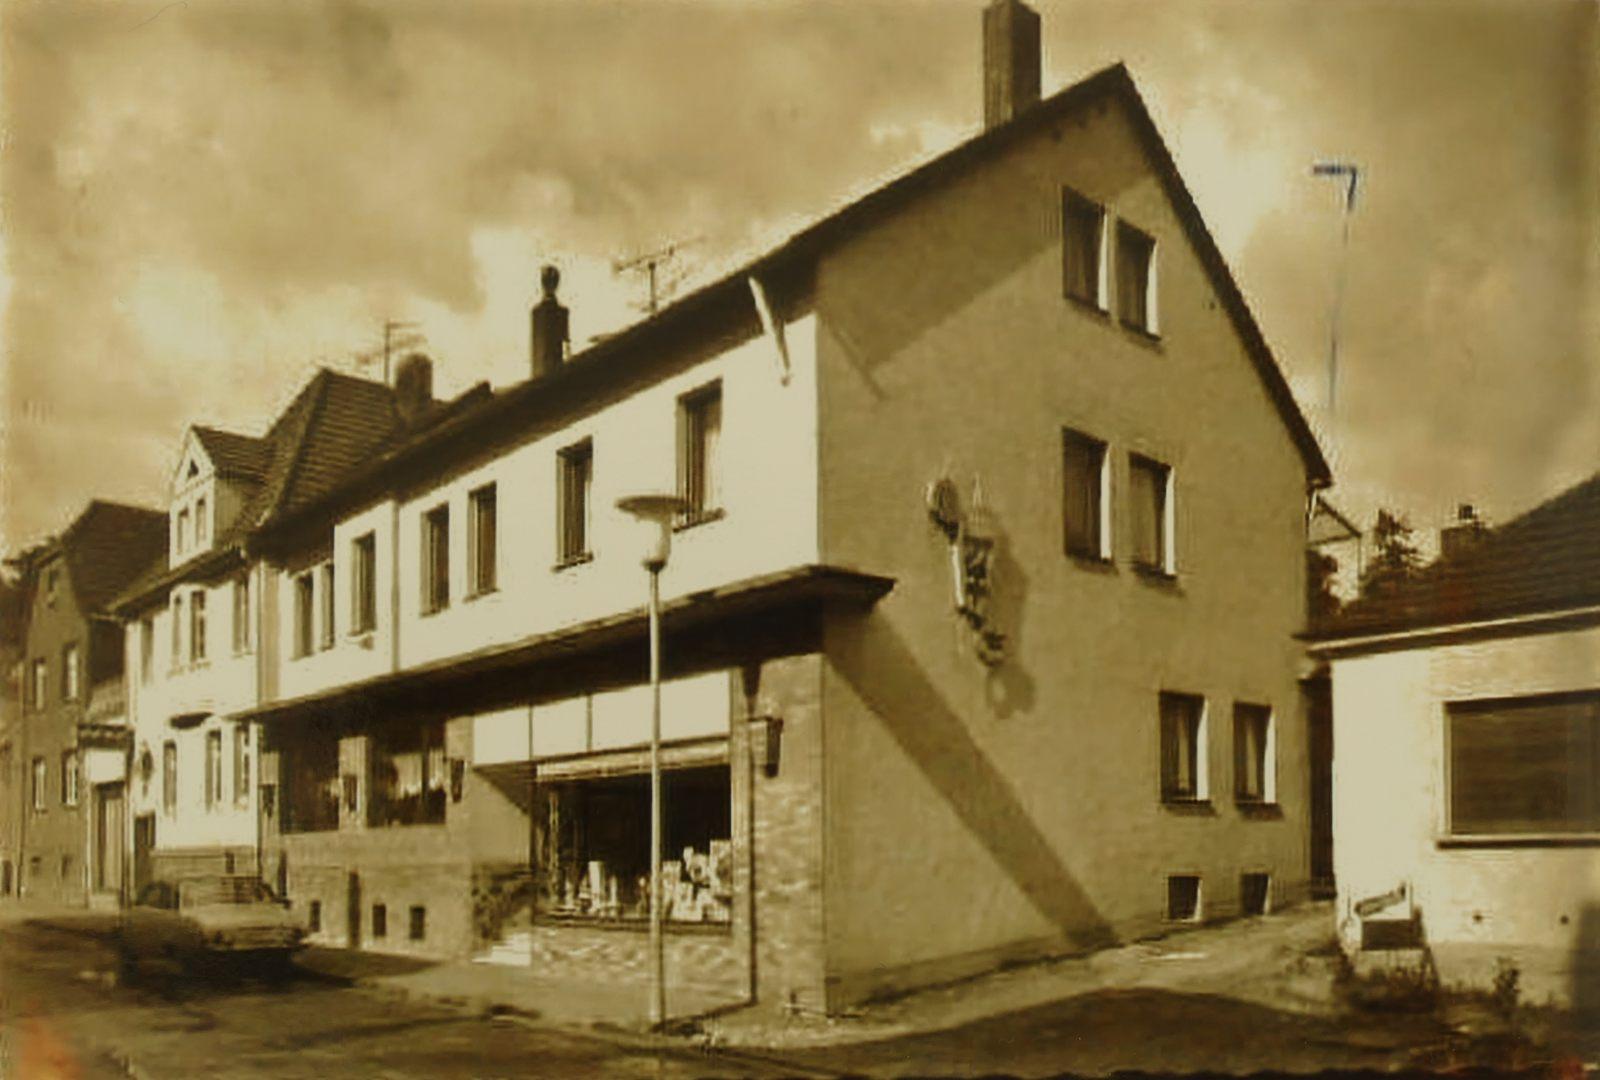 Kretzer 1960